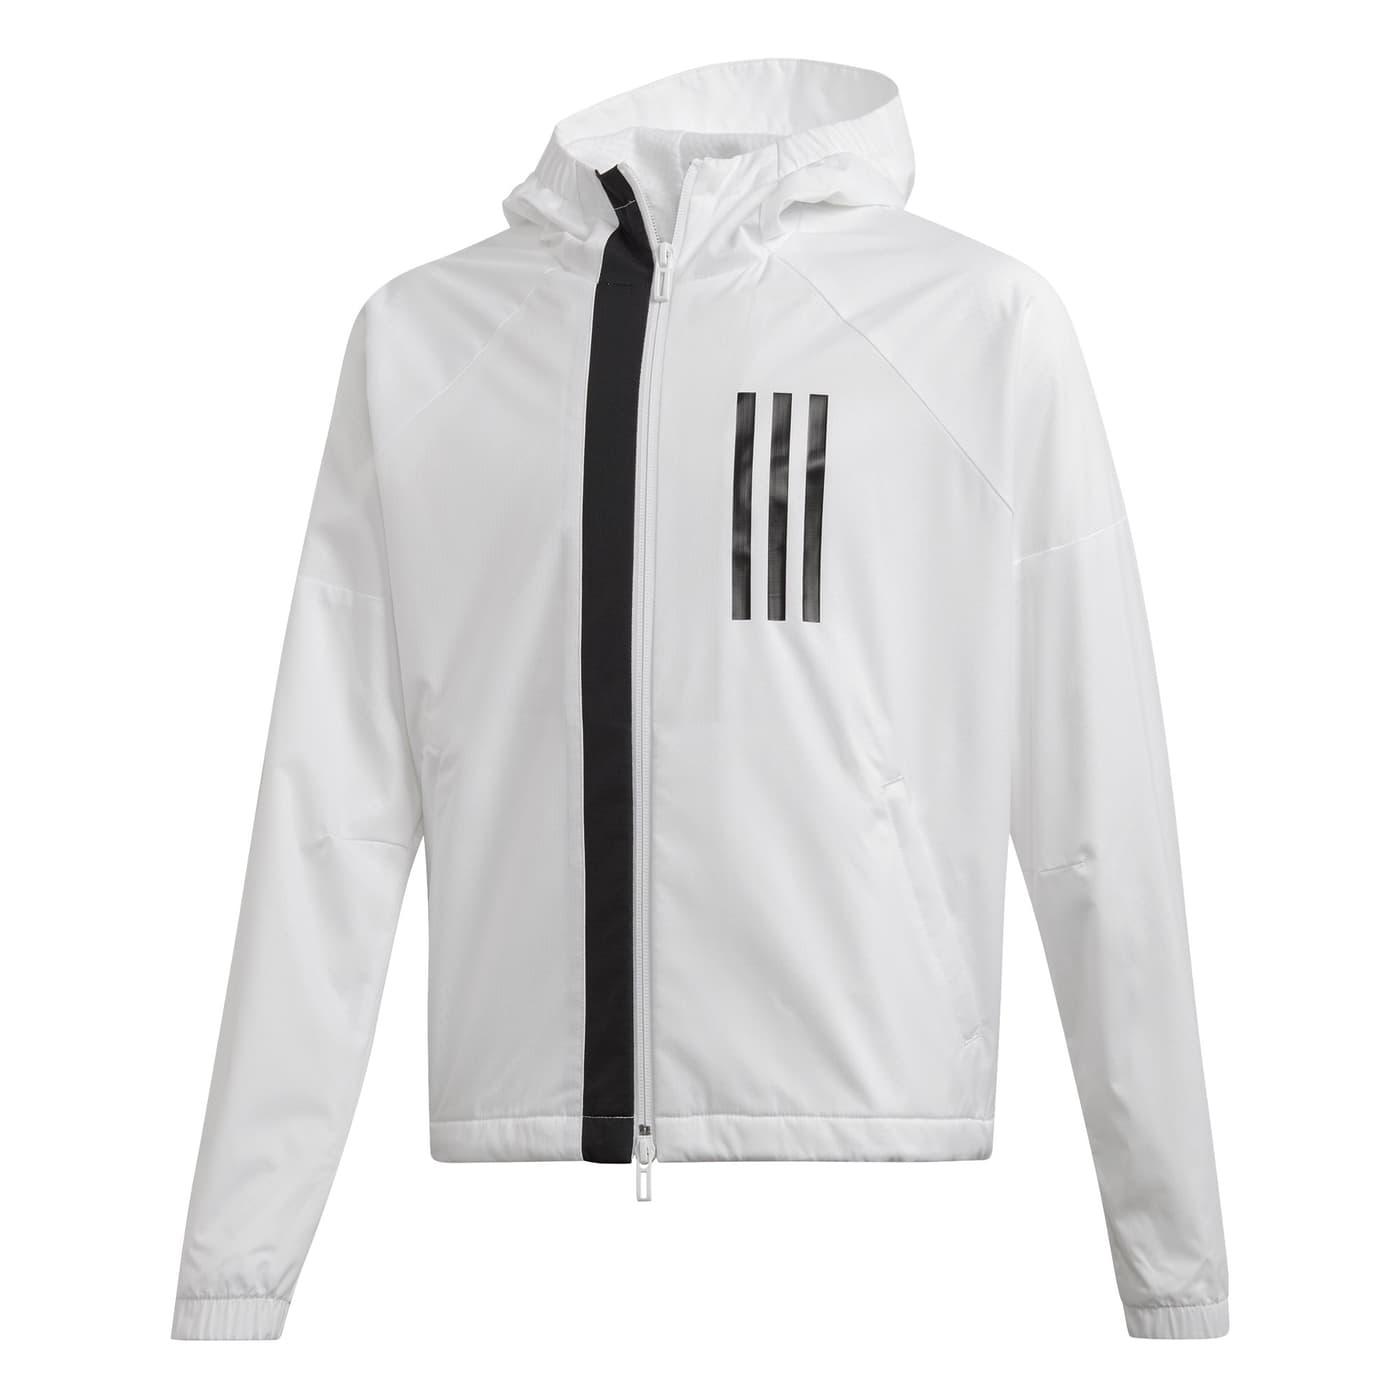 Da Adidas Jacket Vento A Id Giacca Qsewugxf Wnd Ragazza Wind Migros q85xtwCR